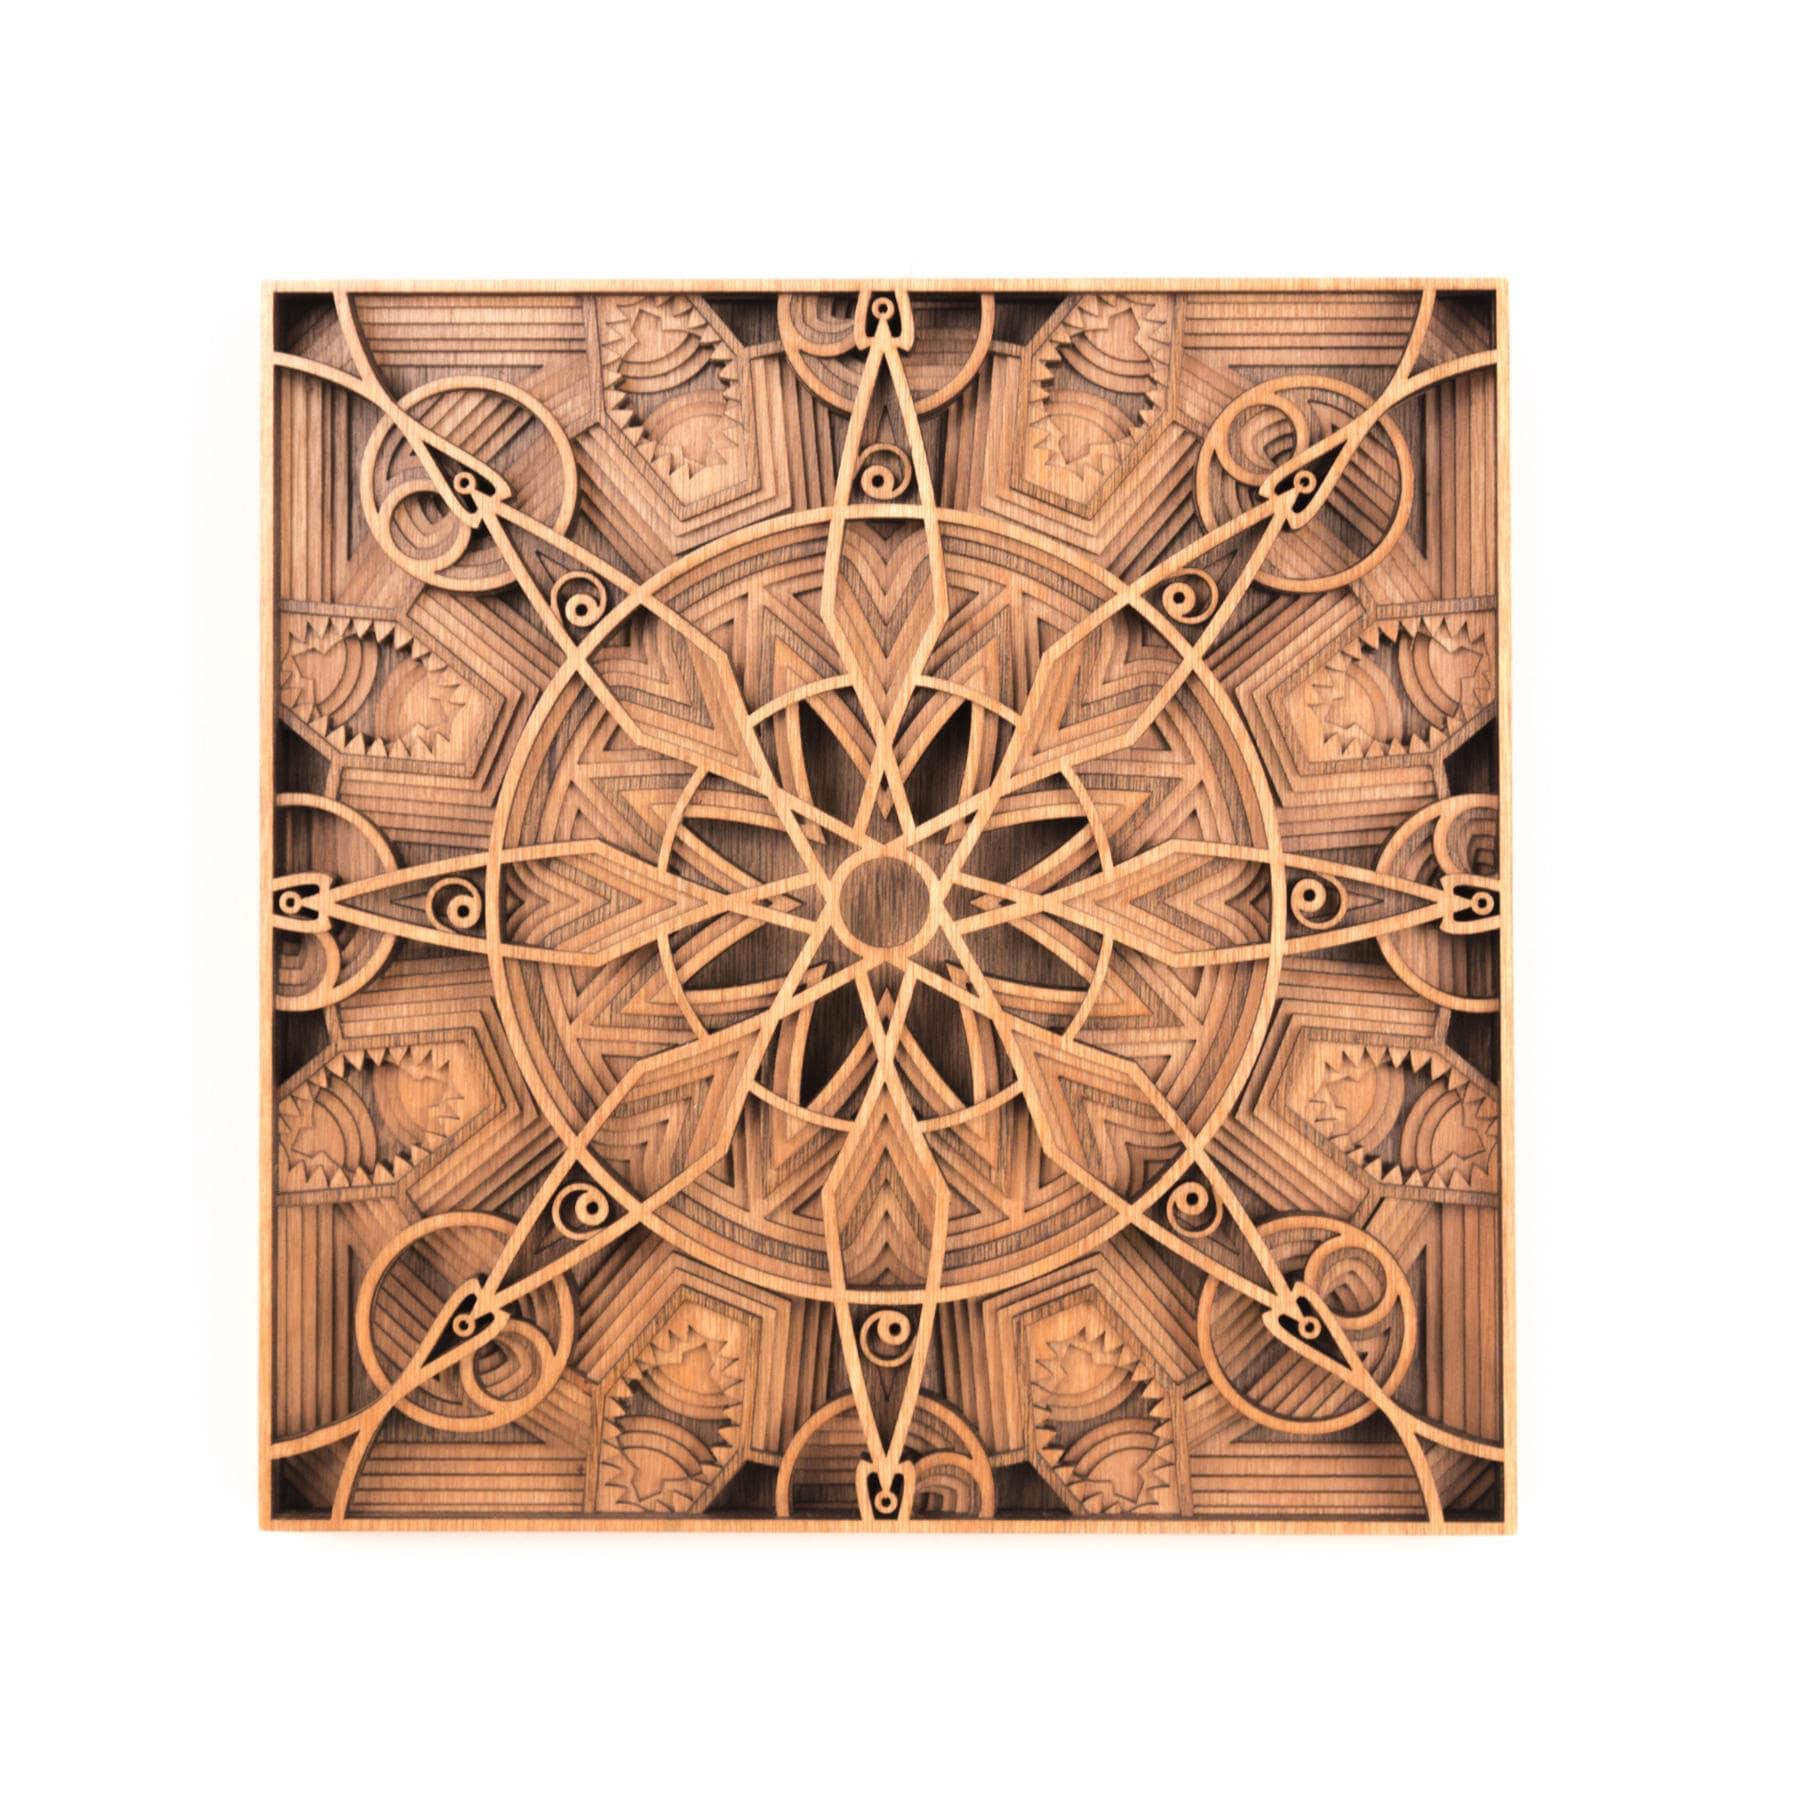 8 layer alberta layered wood designphilip